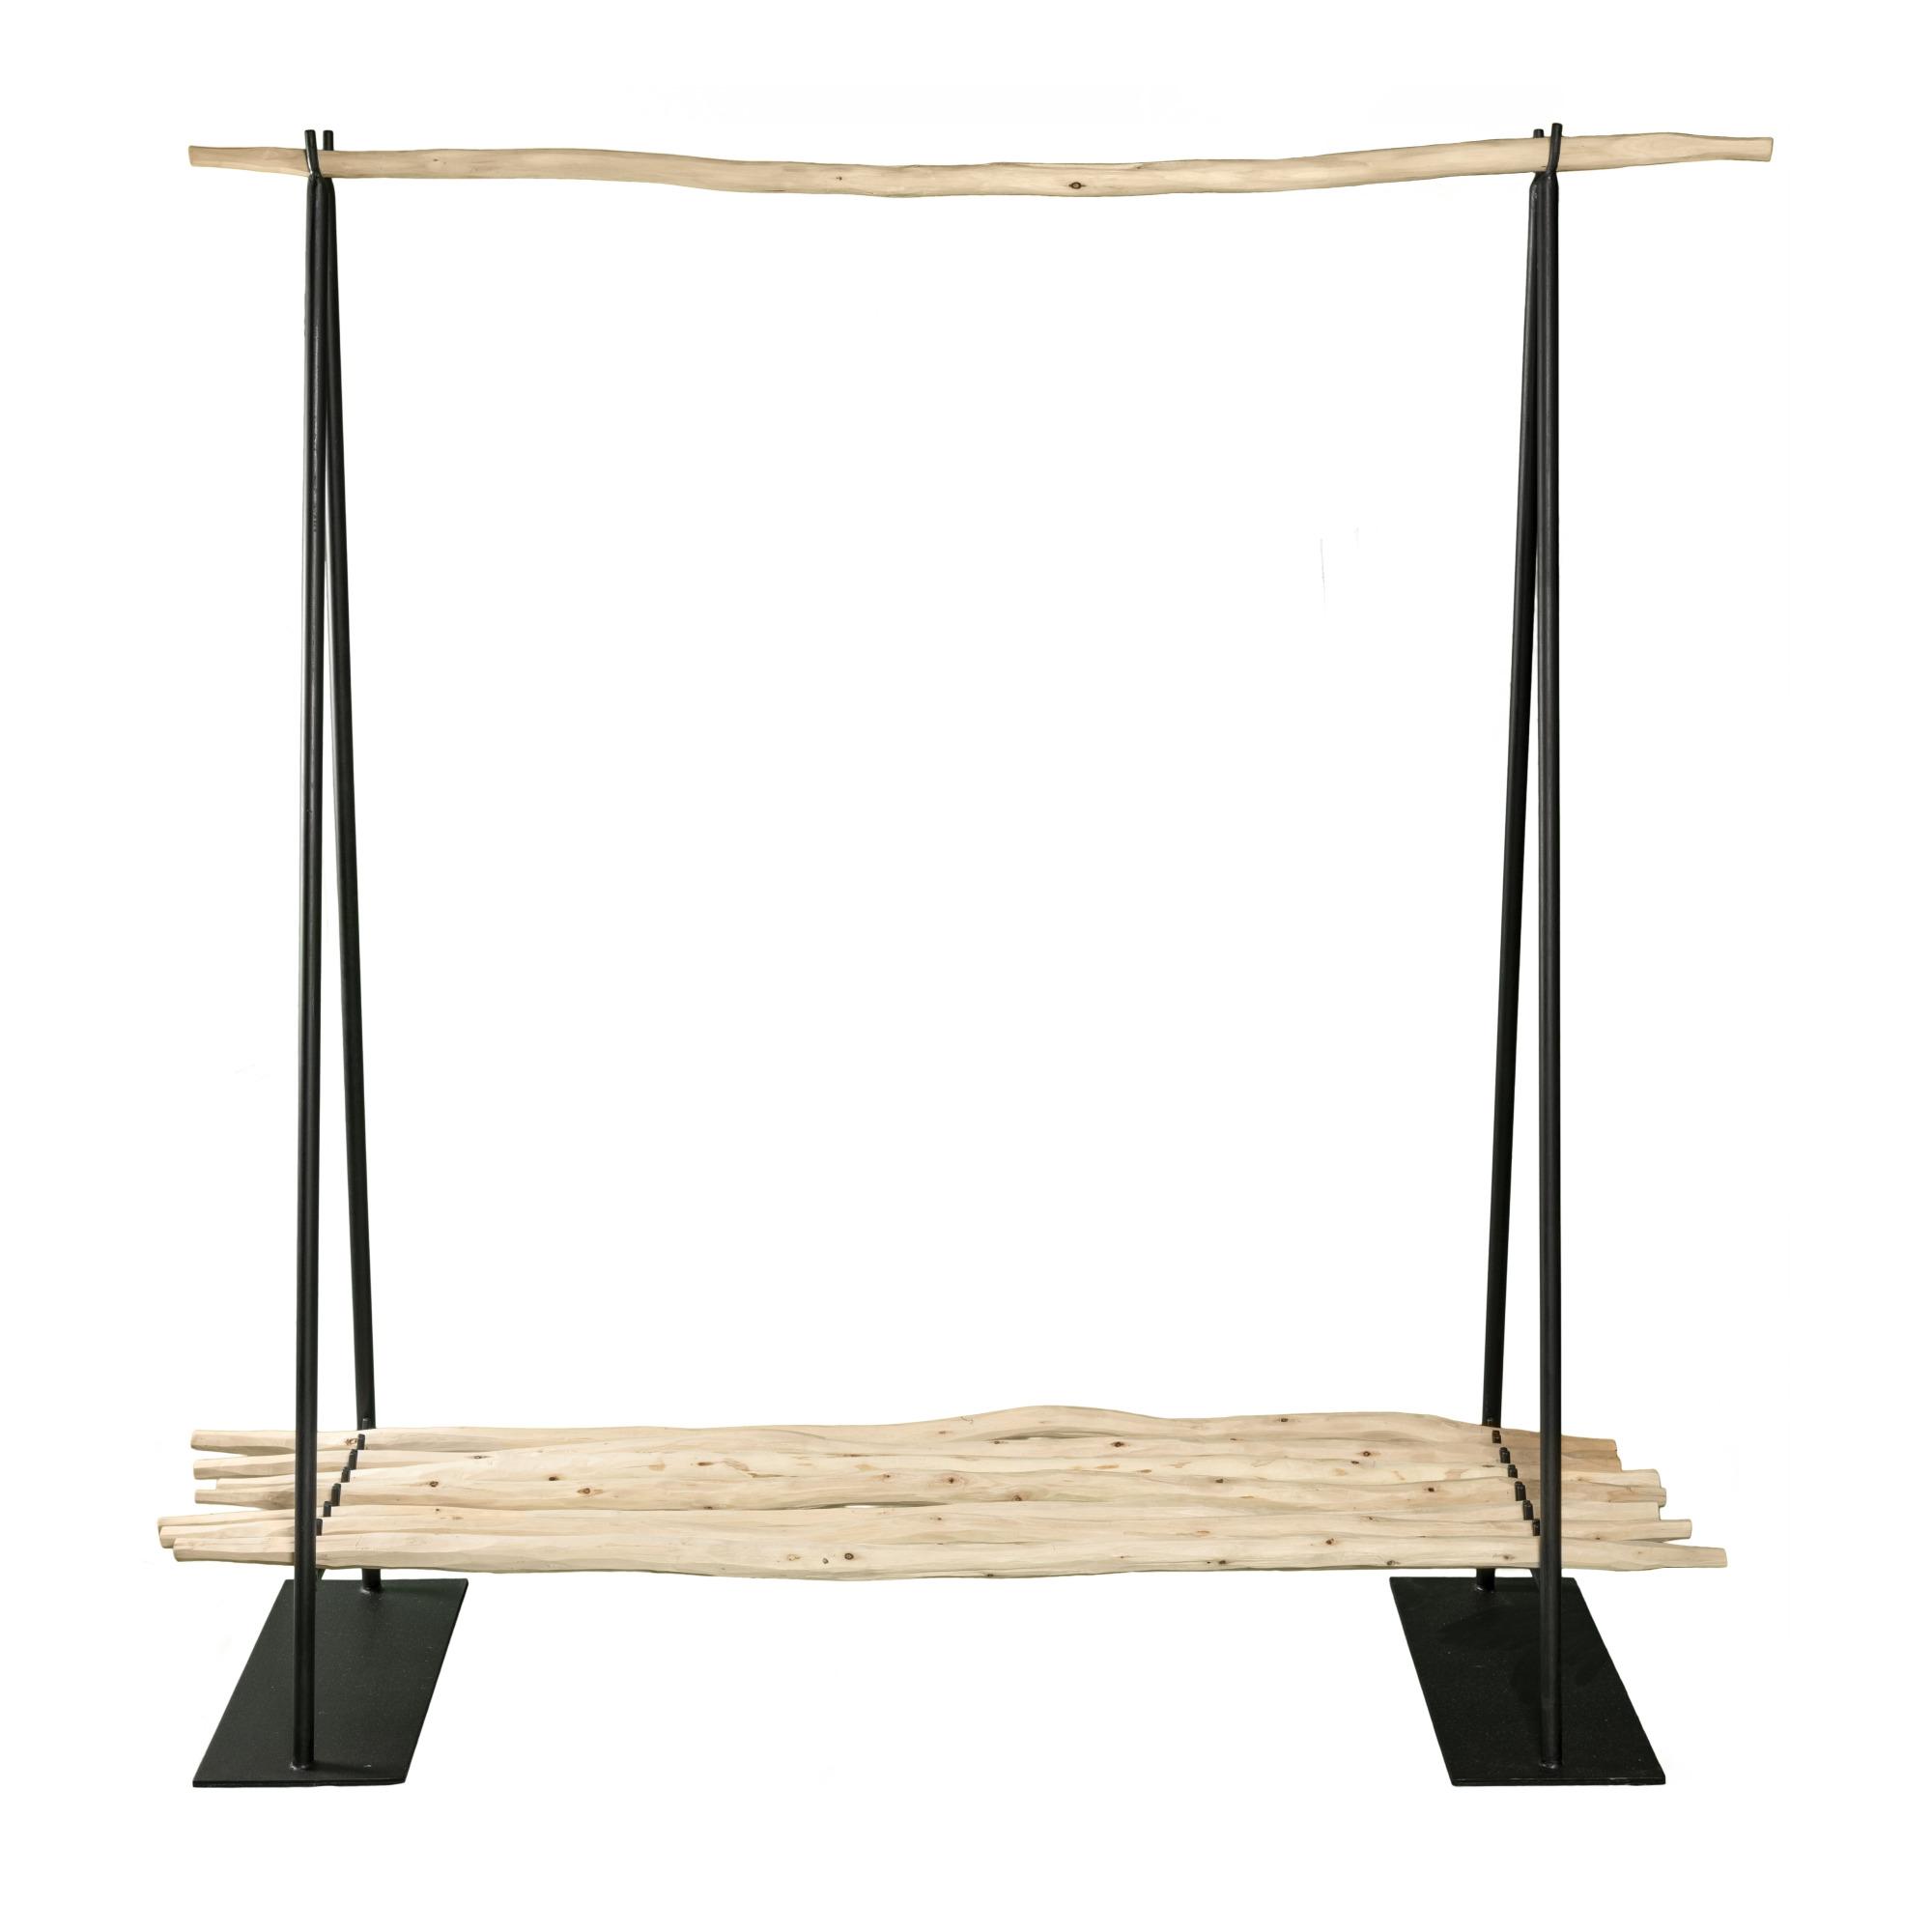 Clothing Rack with Shelf 150 x 50 cm Aktion